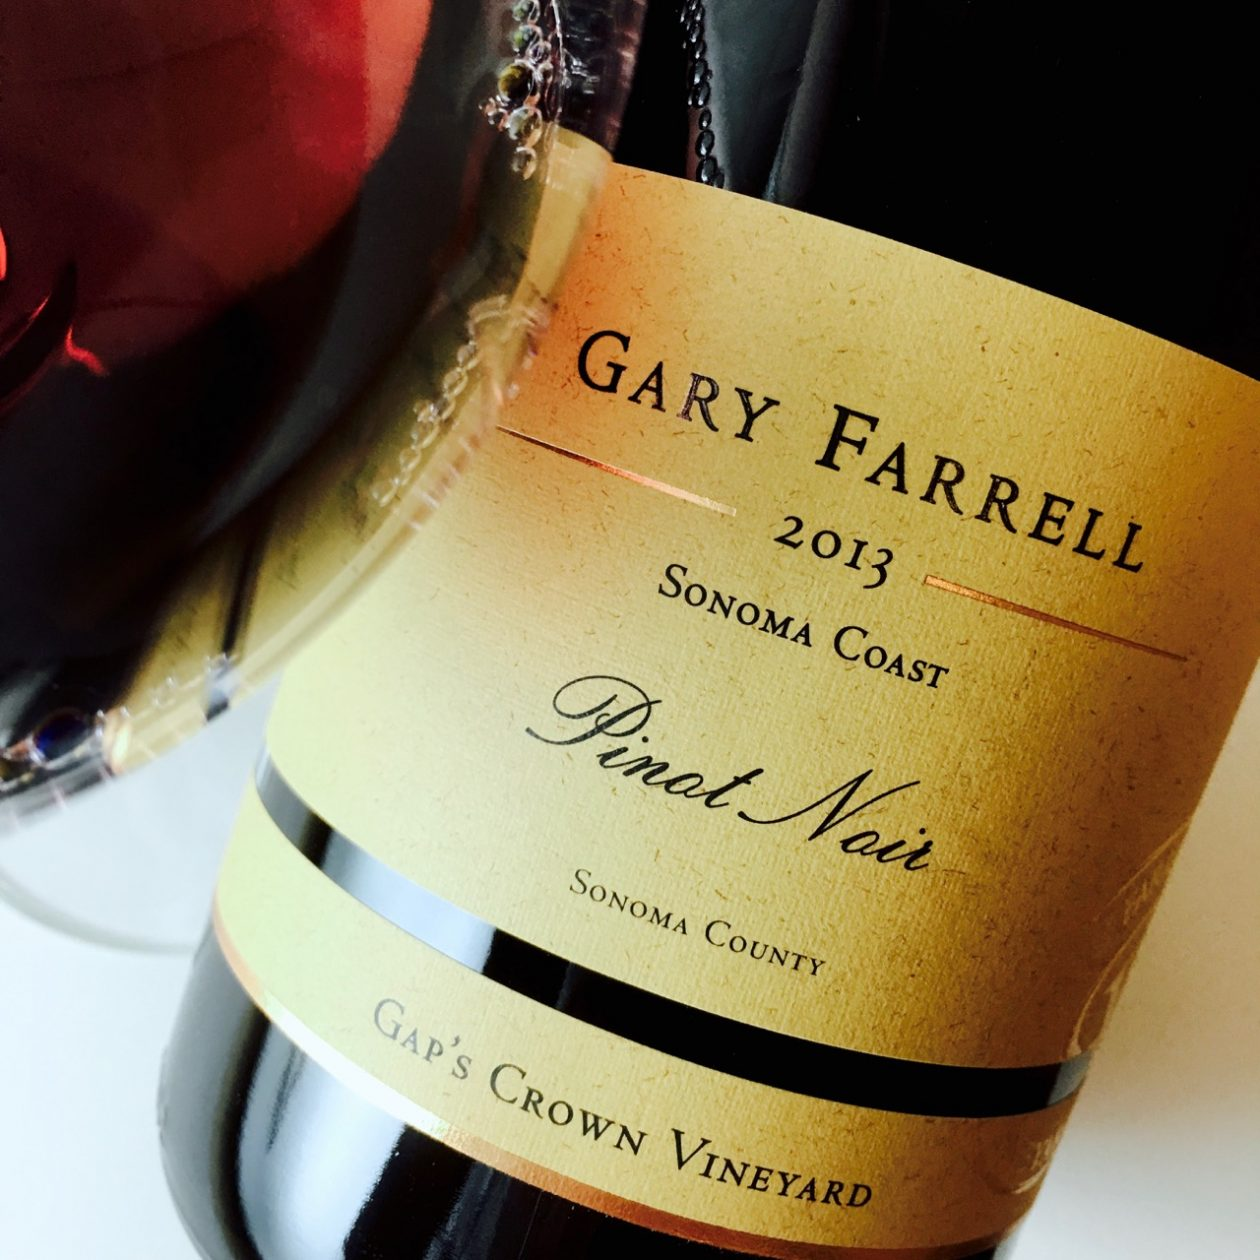 2013 Gary Farrell Pinot Noir Gap's Crown Vineyard Sonoma Coast, Sonoma County